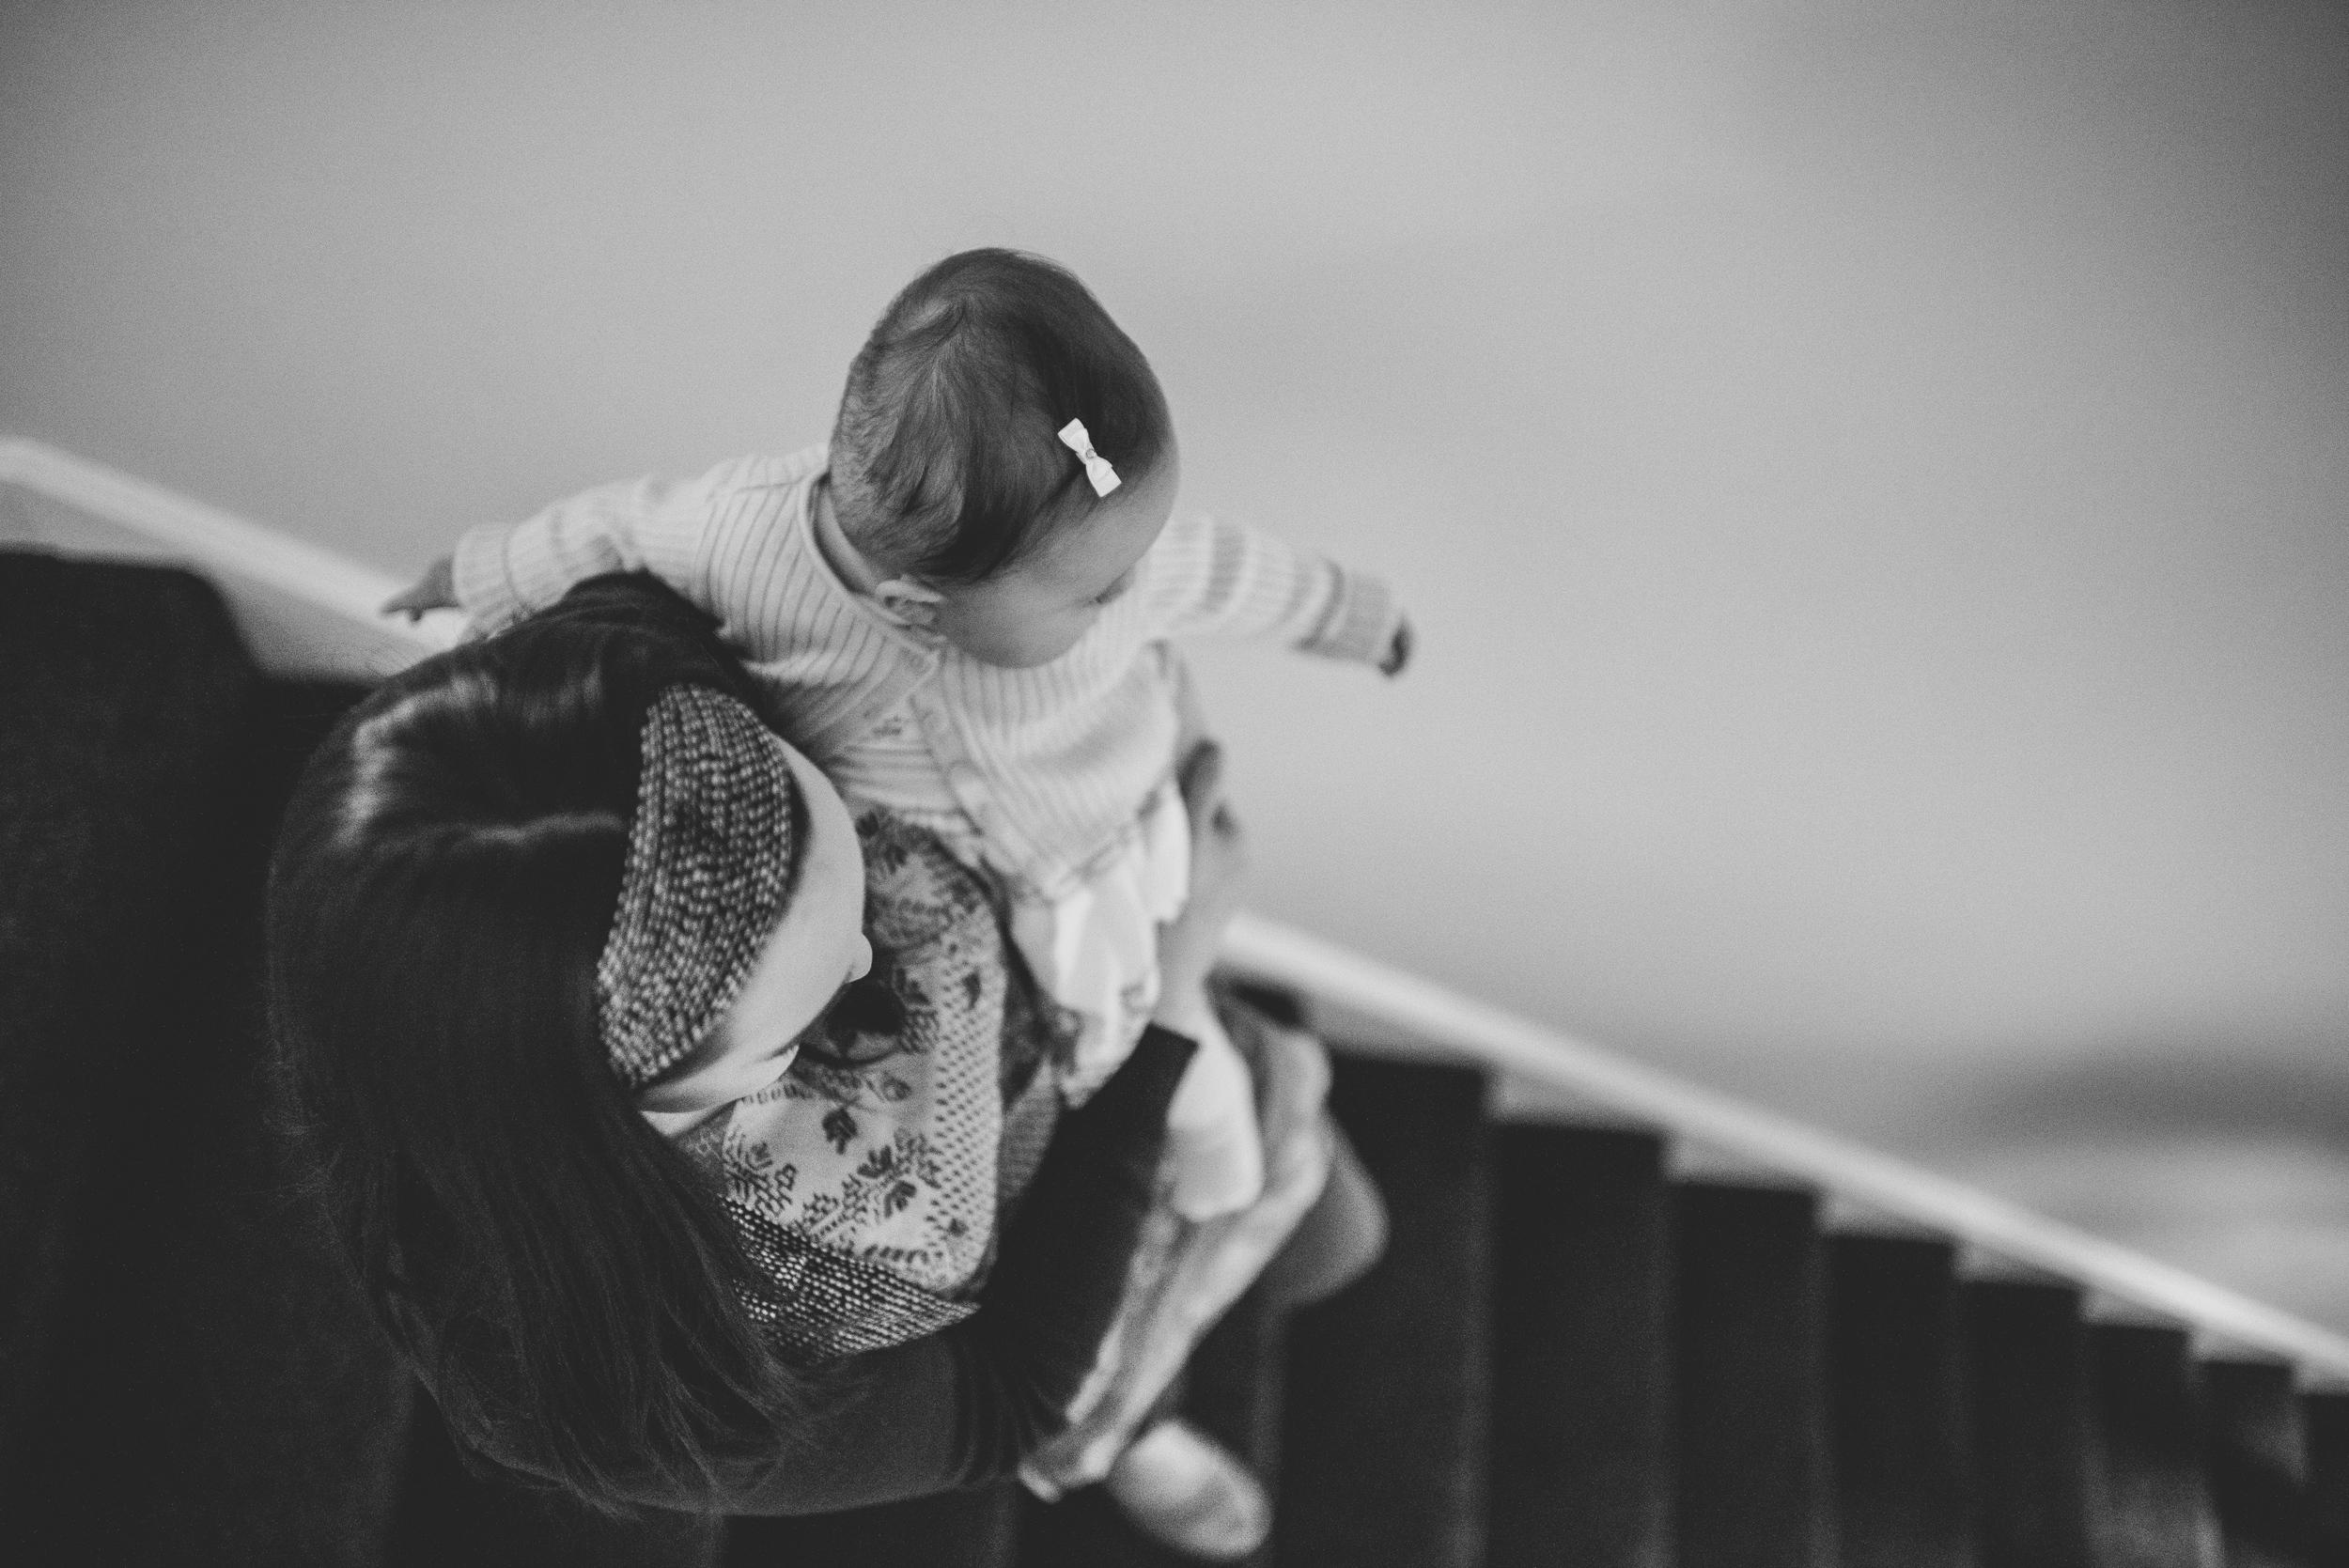 0038-ALTERNATIVE-WEDDING-PHOTOGRAPHER-GLASGOW-FAMILY-PHOTOGRAPHER-KIDS-PORTRAITS-BABY-PORTRAITS-GLASGOW.JPG